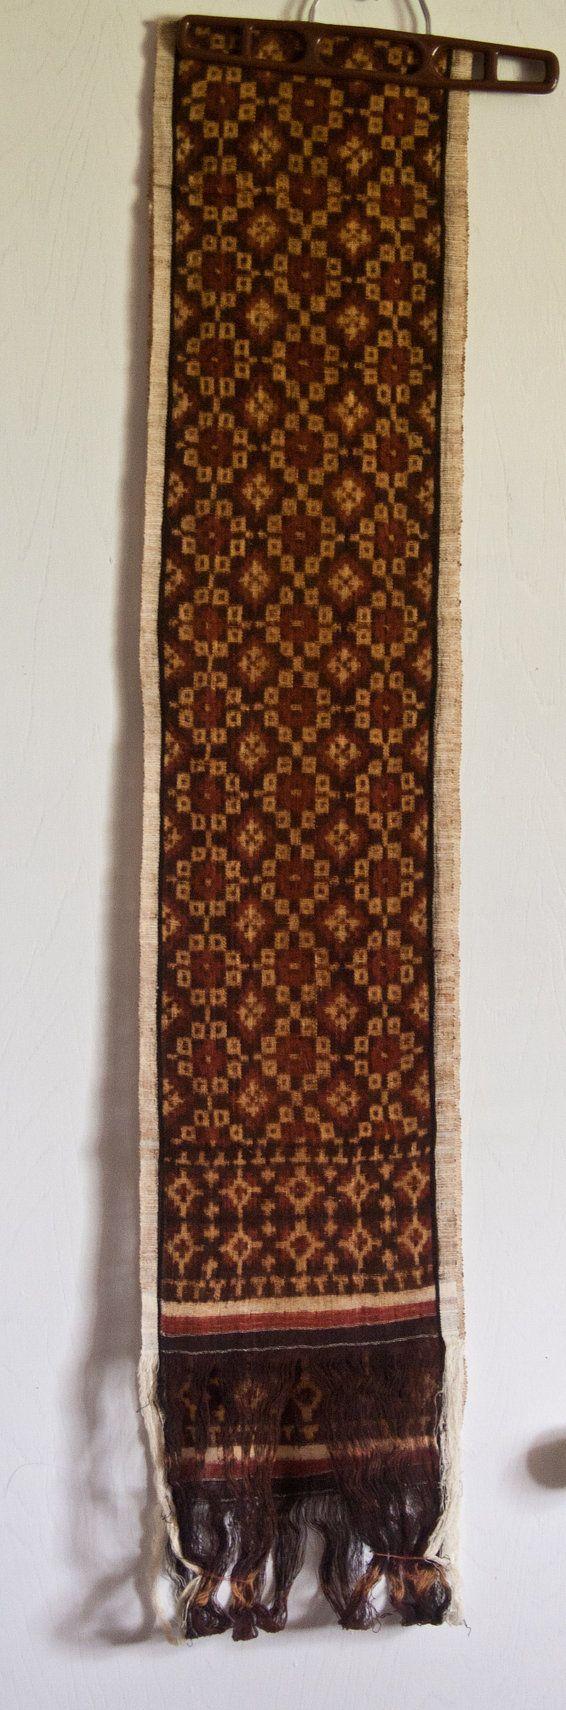 Knitting Factory Bali : Best scrapbook ikat bali images on pinterest